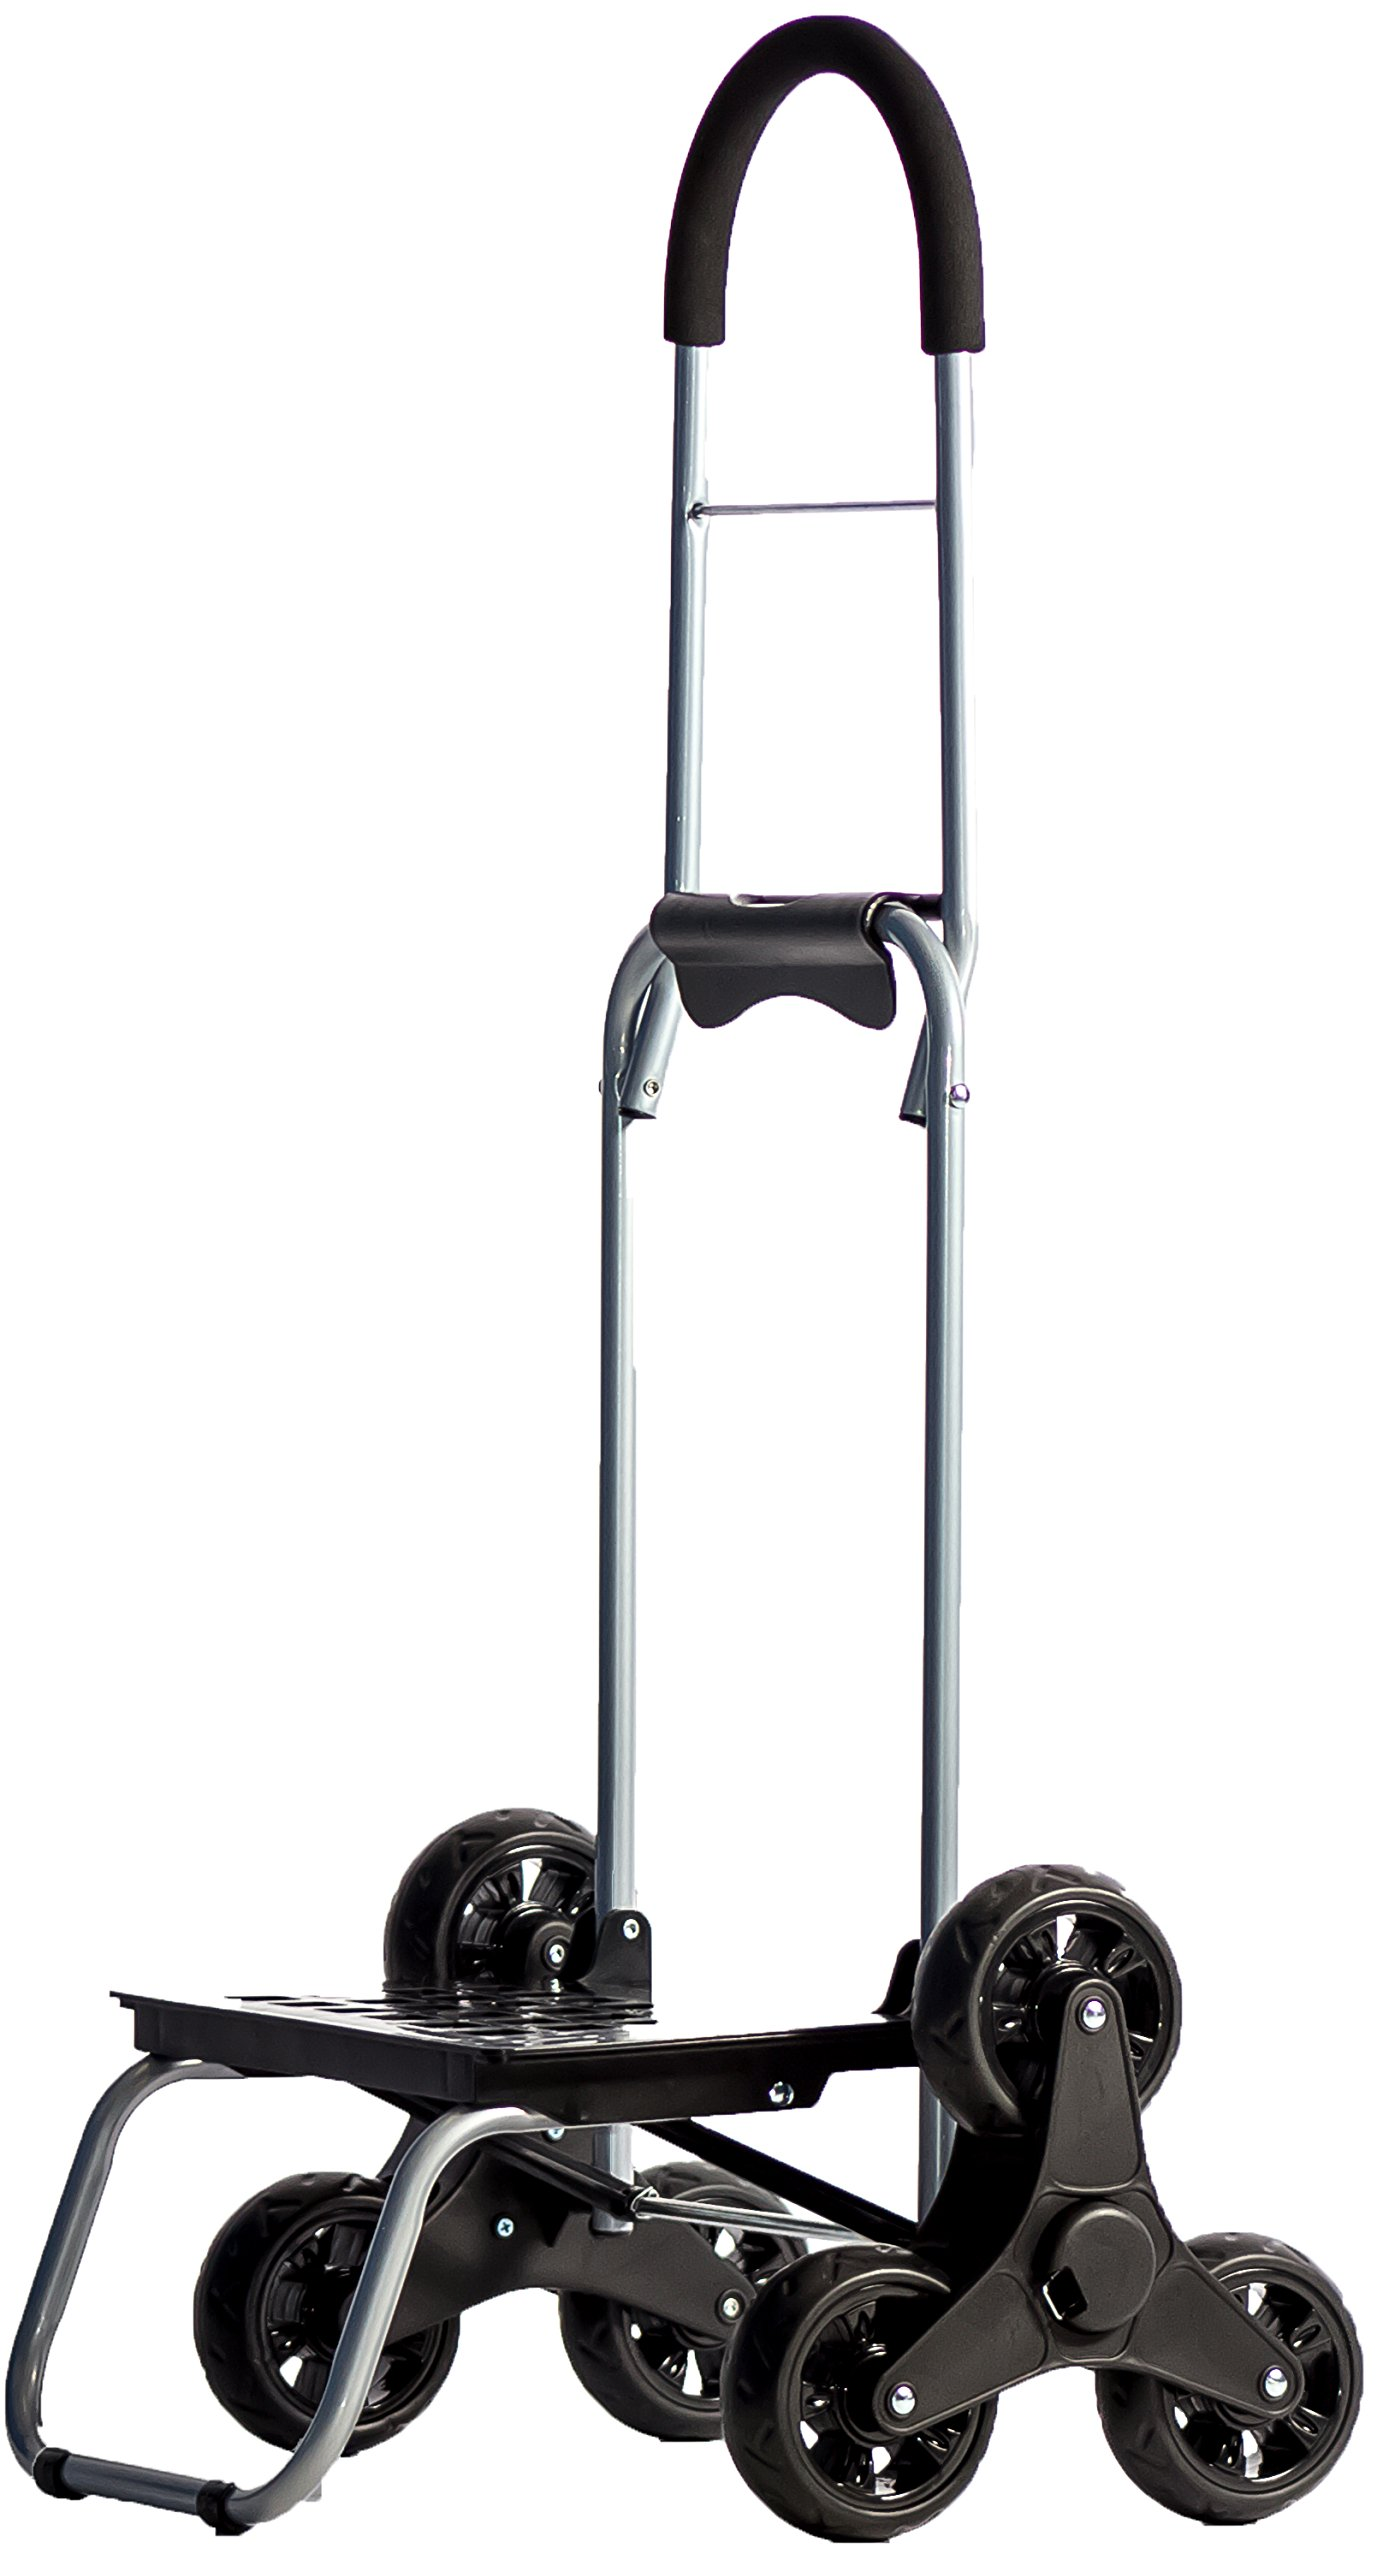 Stair Climber Mighty Max 2 Personal Dolly, Black Handtruck Hardware Garden Utilty Cart